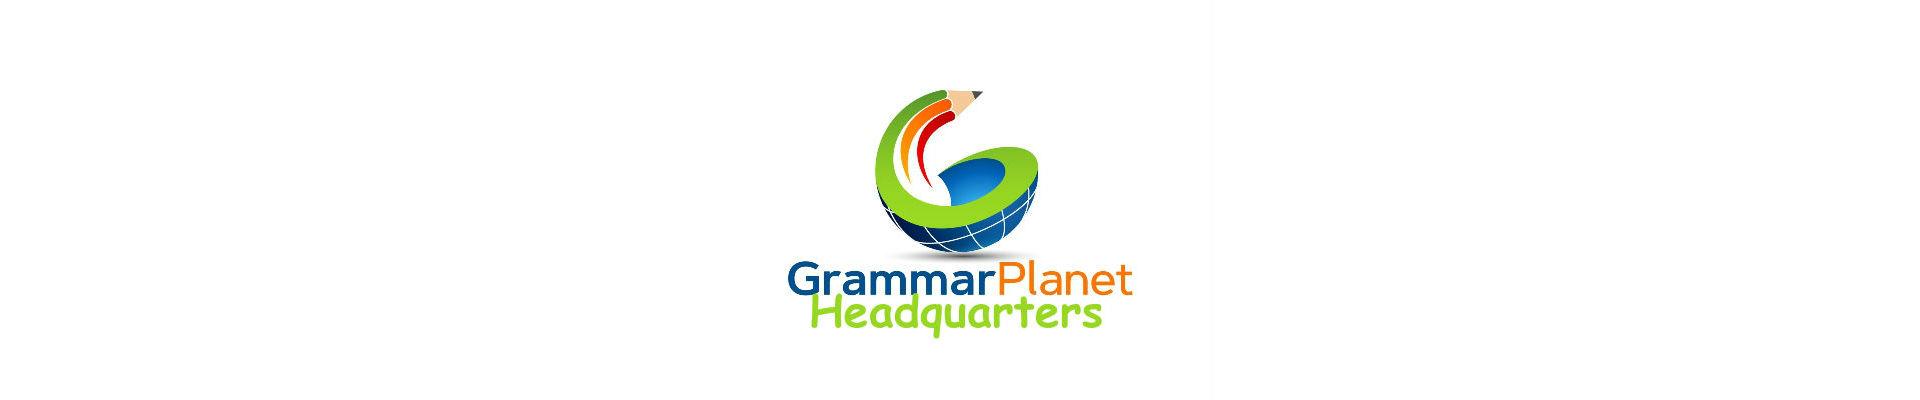 GrammarPlanetHQ